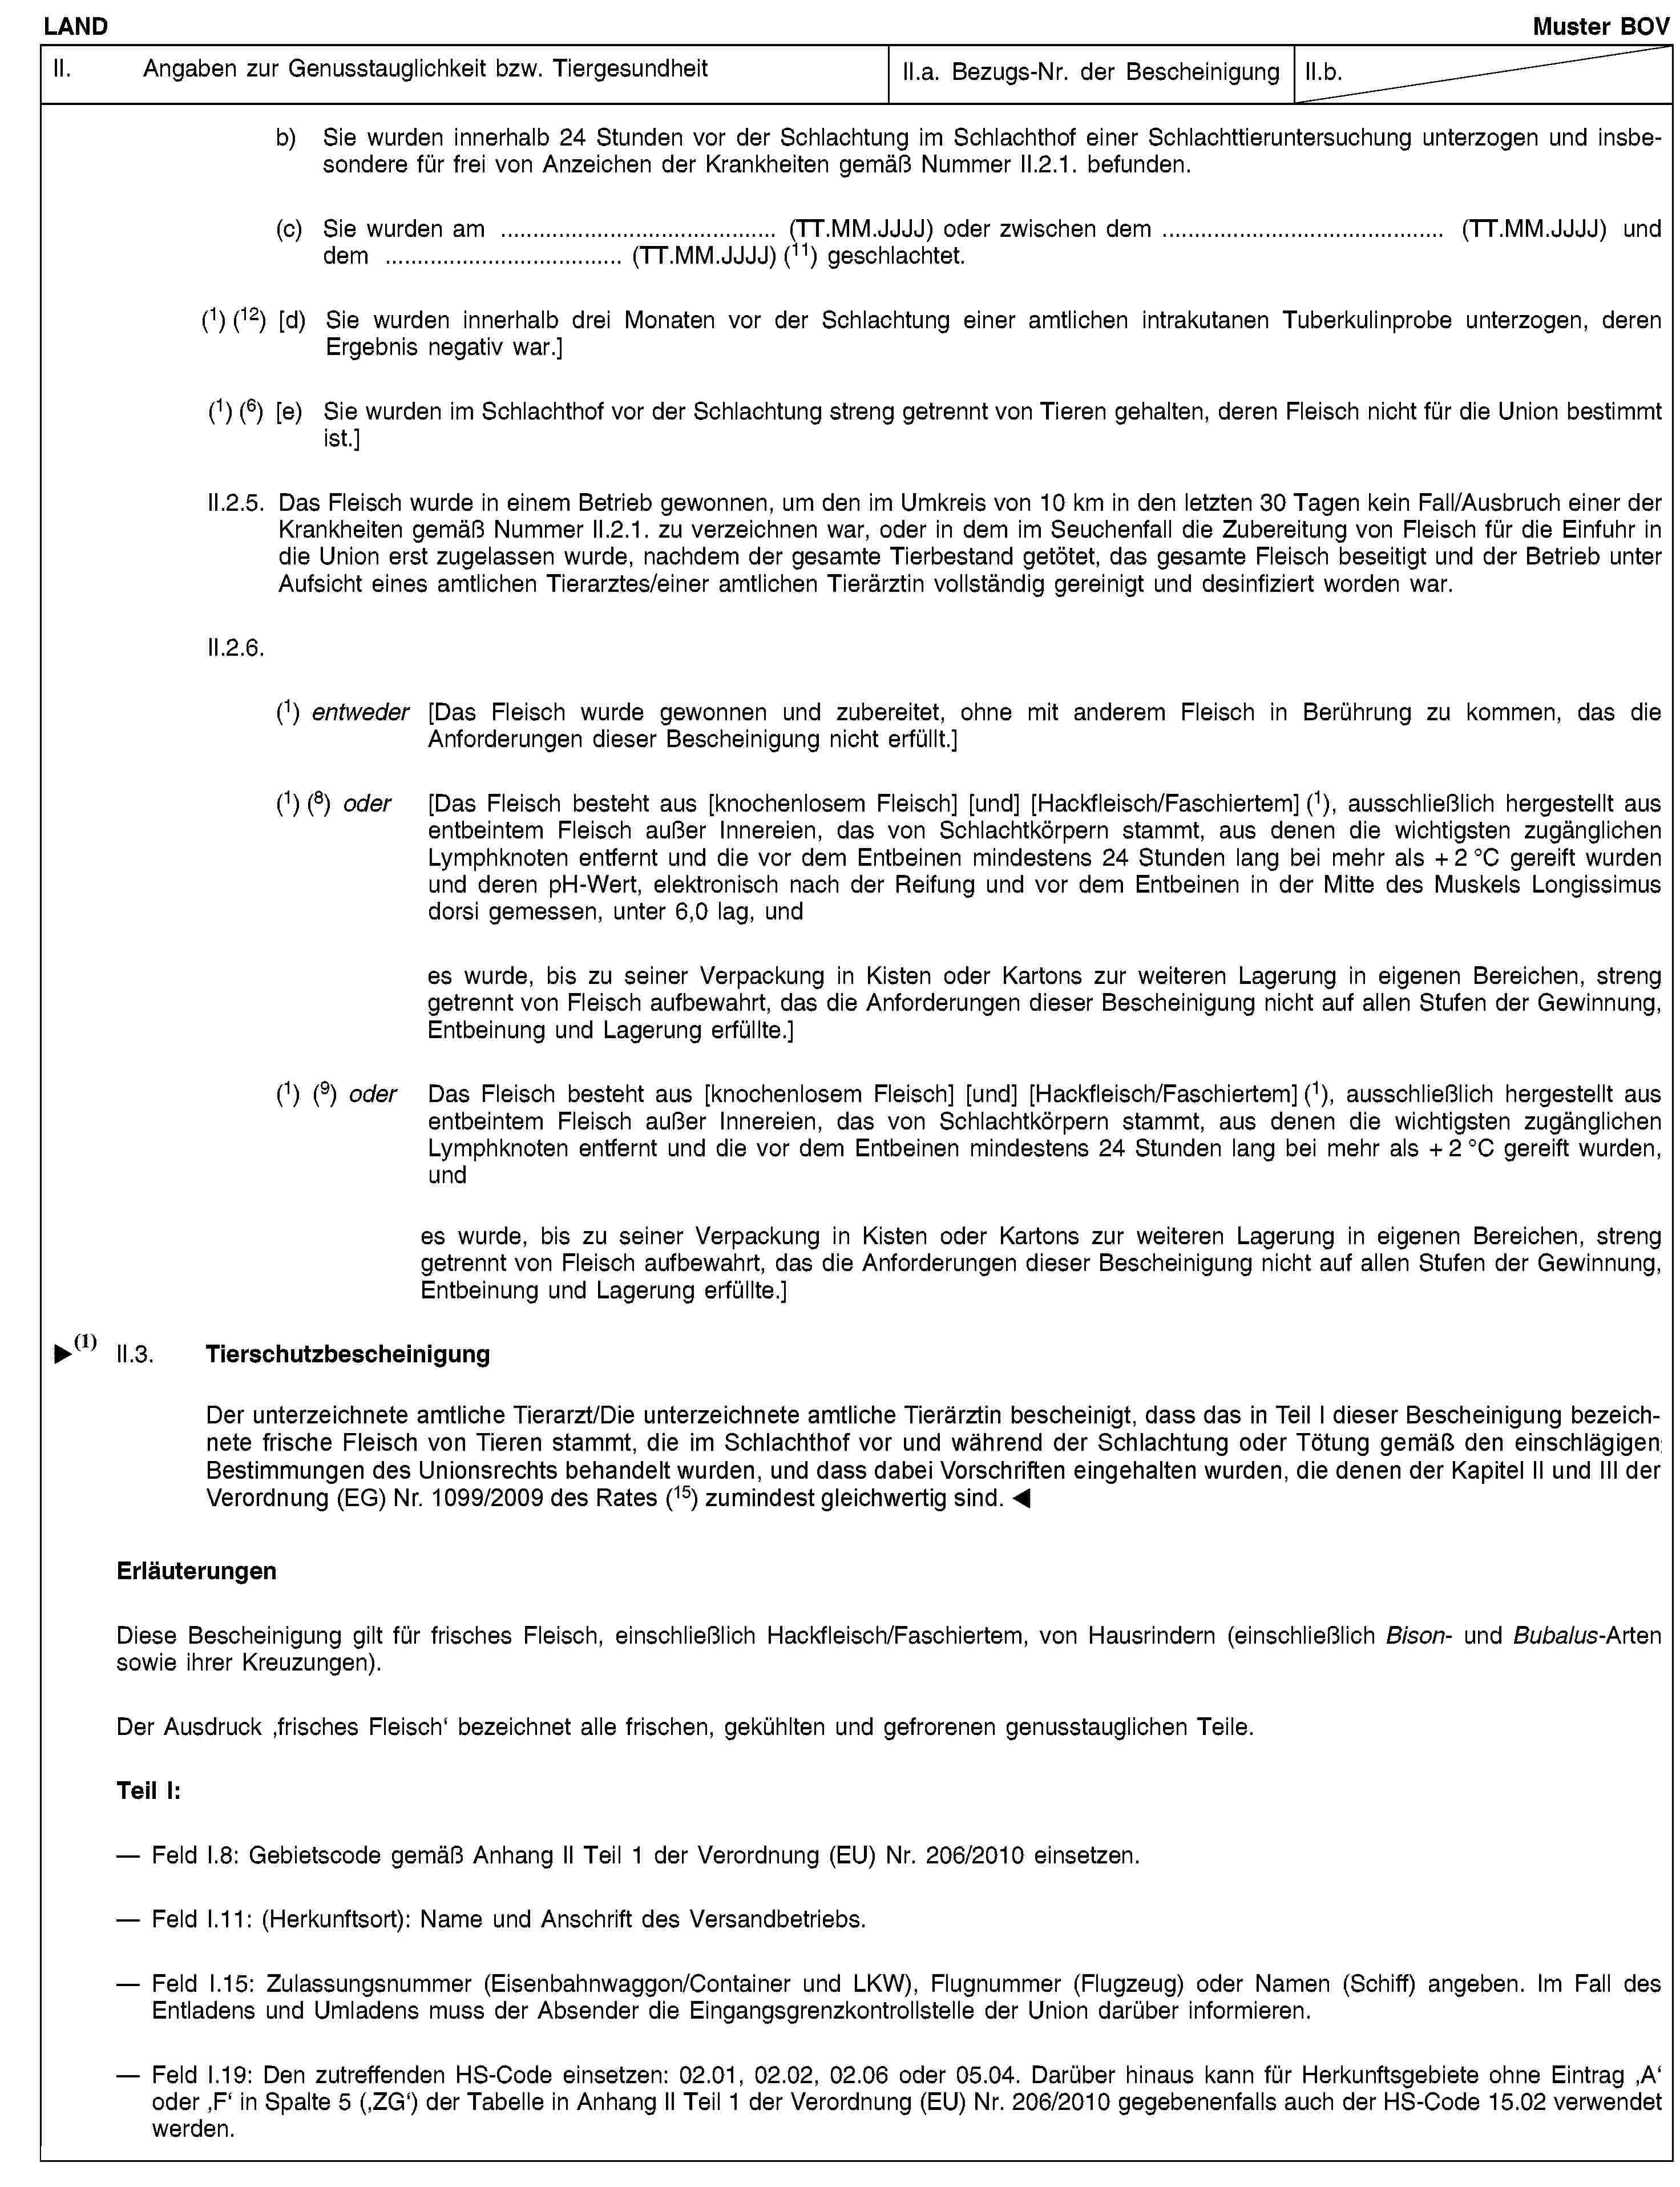 EUR-Lex - 02010R0206-20150417 - EN - EUR-Lex